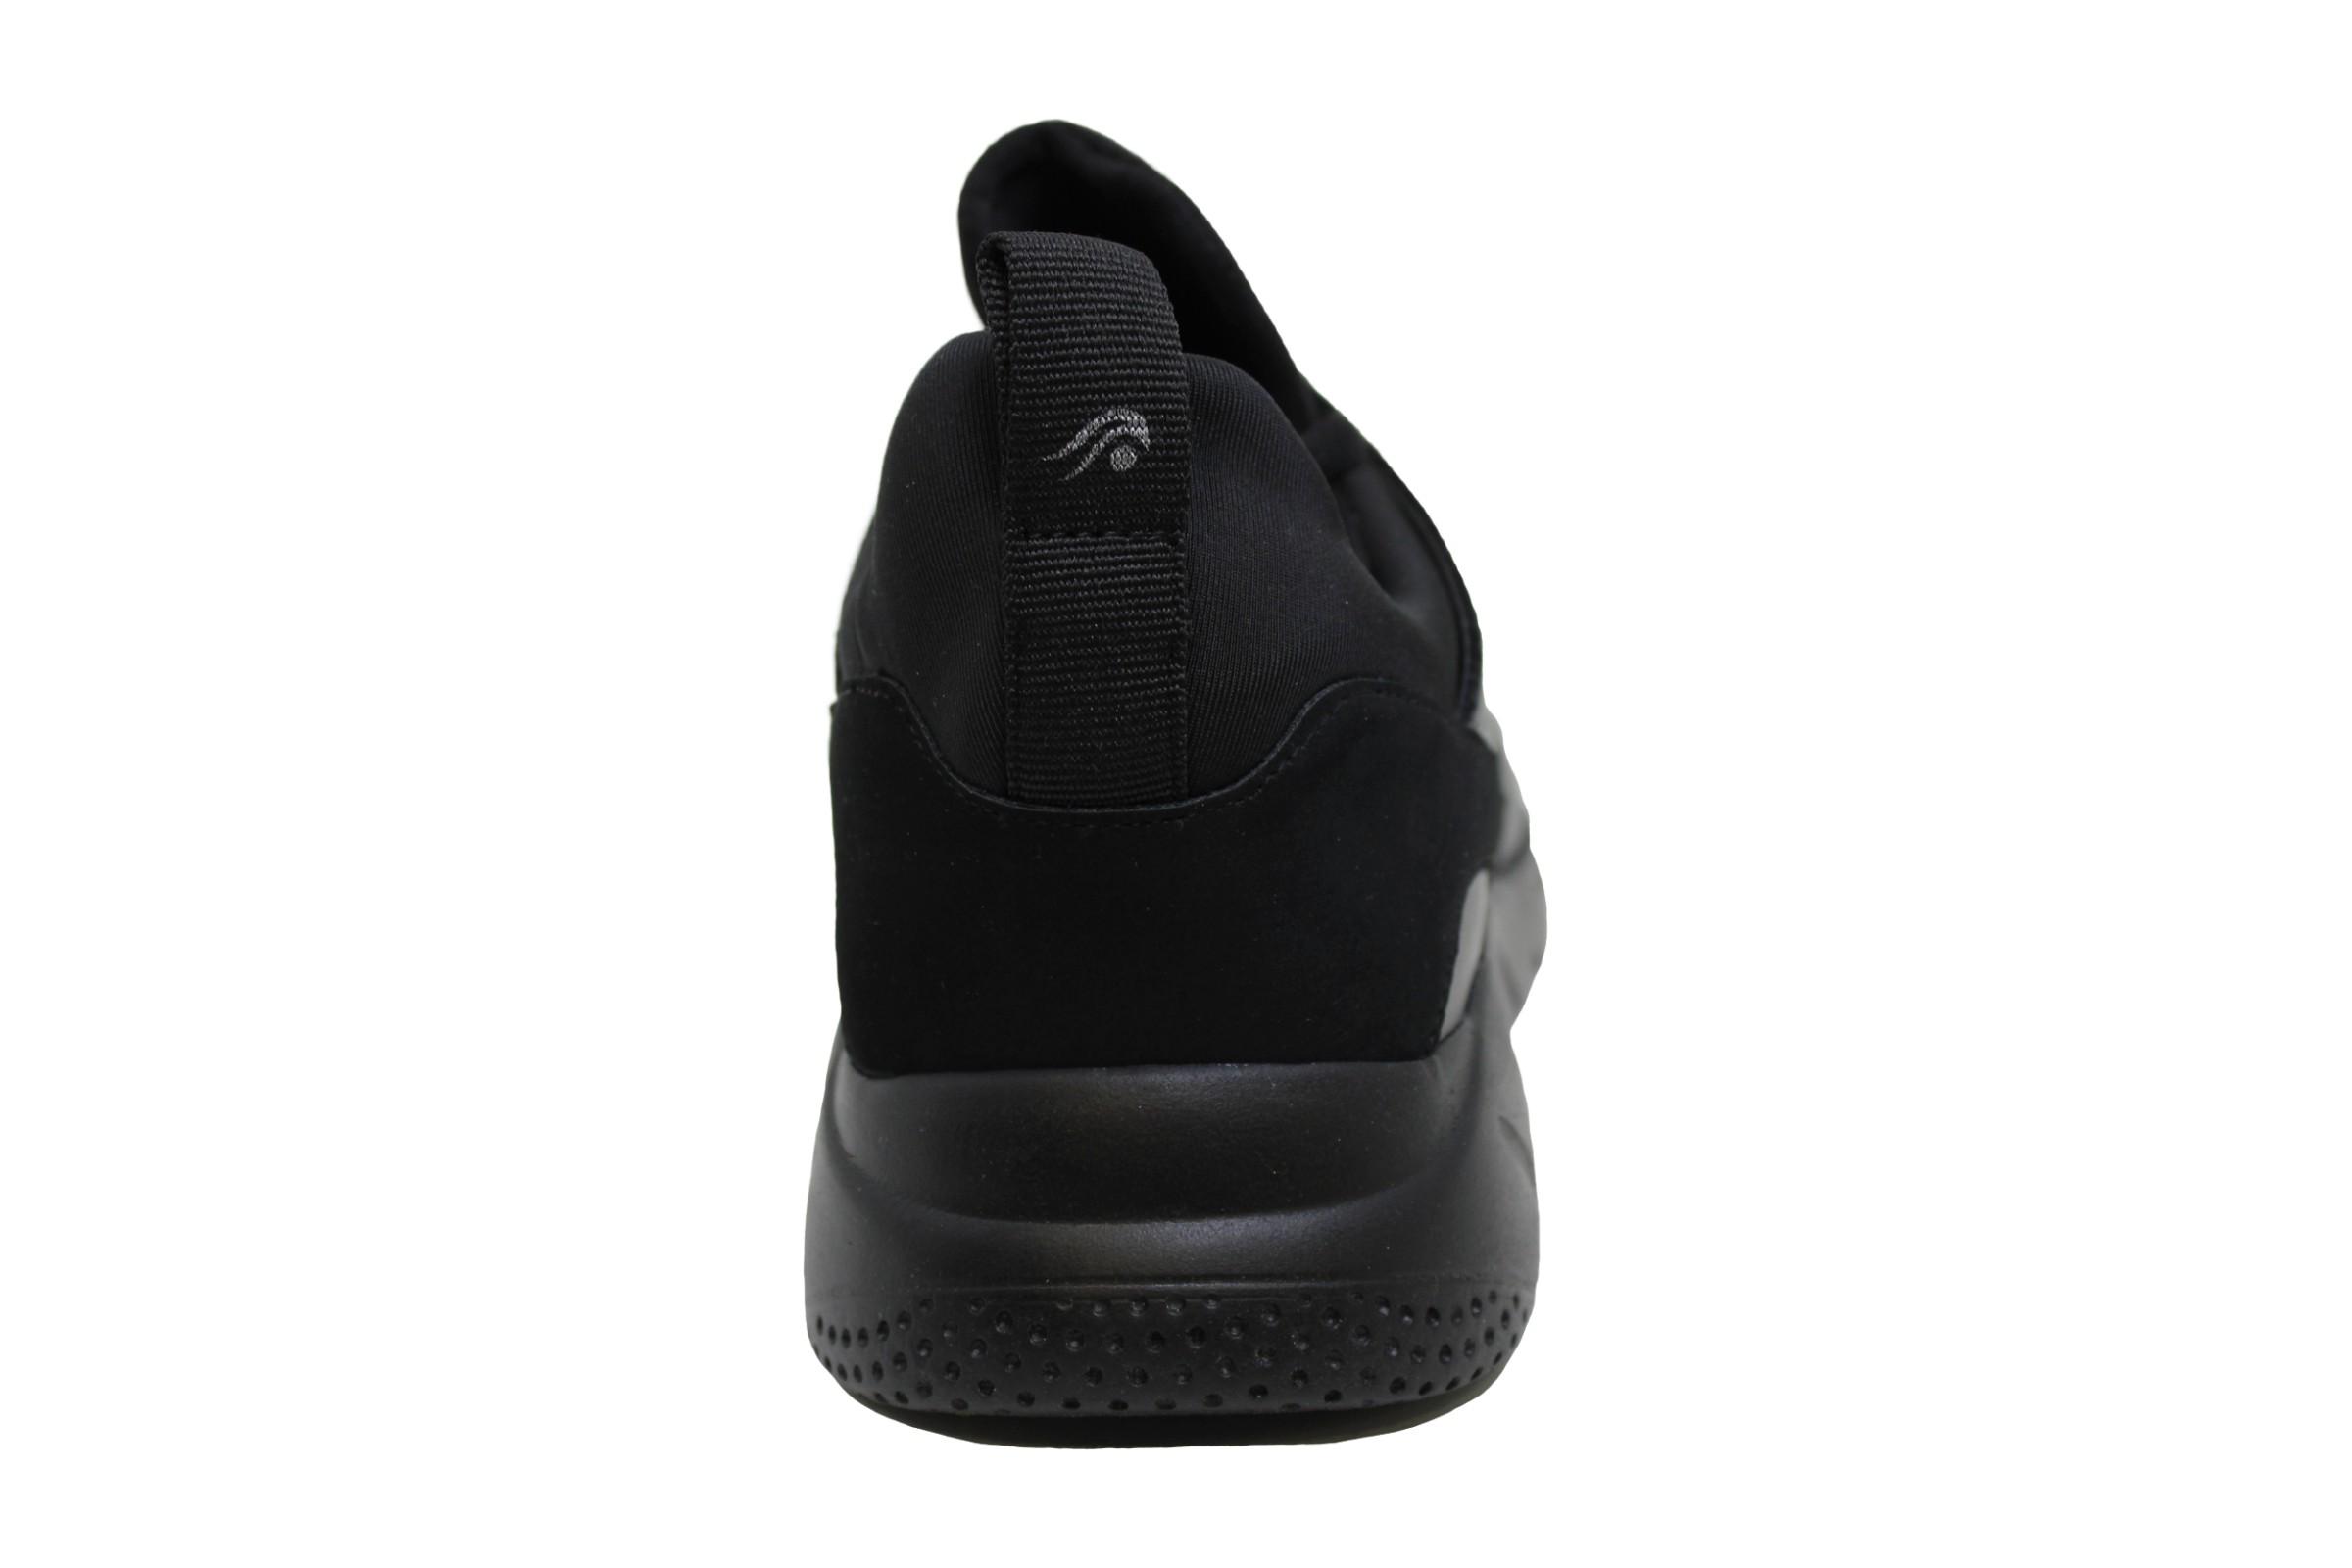 L-039-ideologie-Femme-jonaas-Low-Top-Lacets-Running-Baskets miniature 4